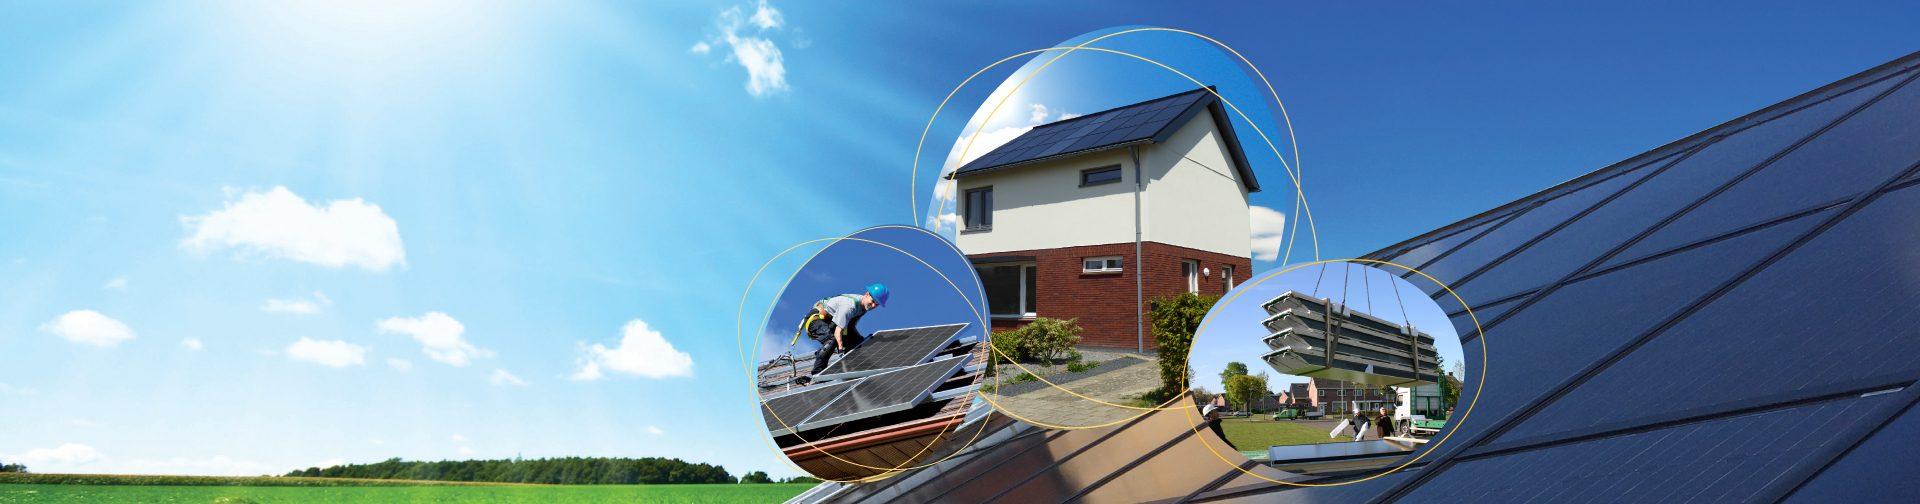 home-banner-zonnepanelen-scx-solar-2